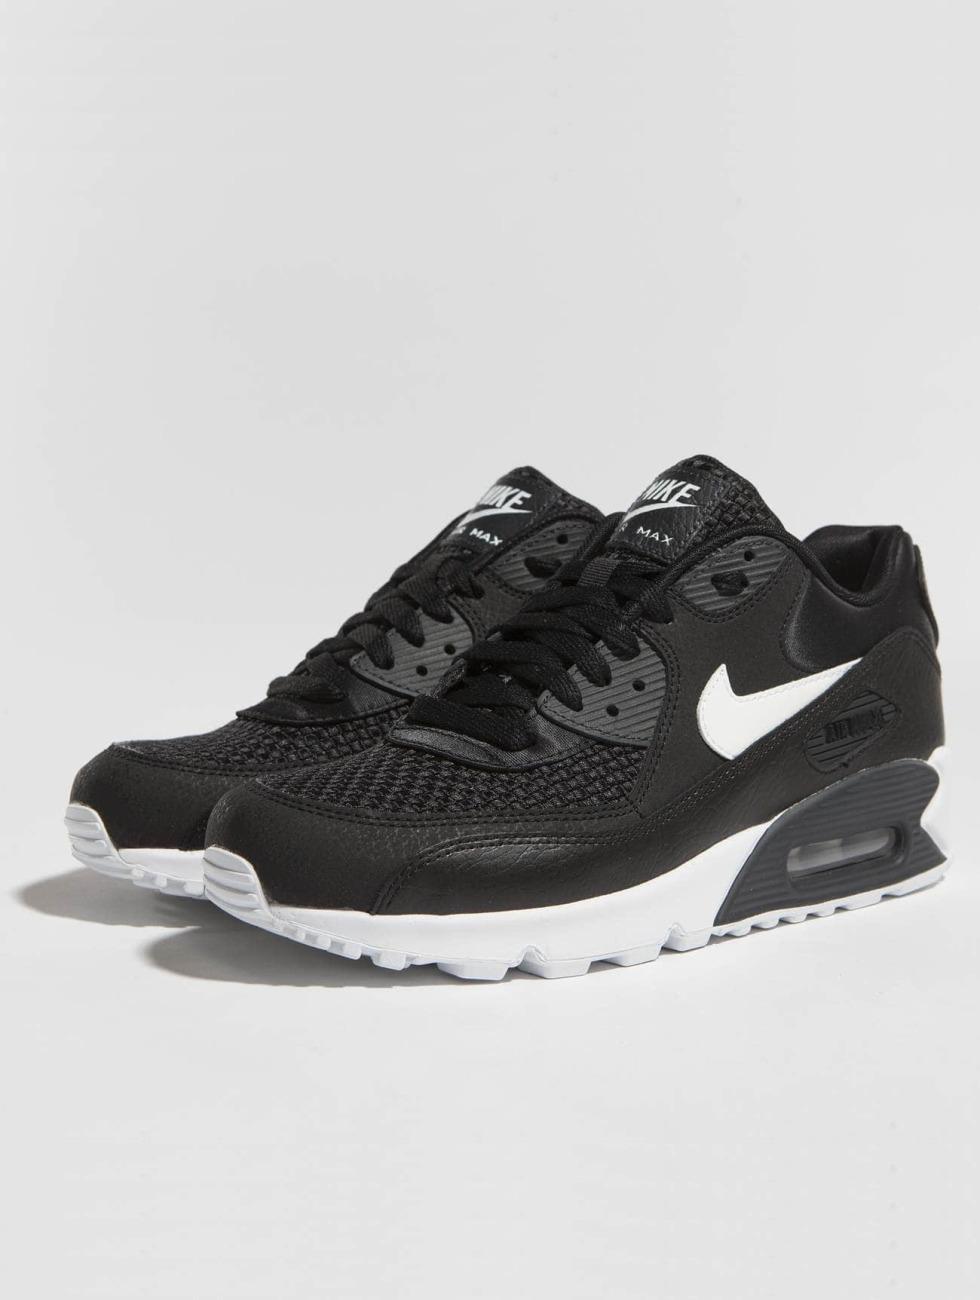 Nike Air Chaussure / Basket Max 90 Se Noir 443 339 Sortie Ebay Grande Vente Manchester À Vendre JbdUWT